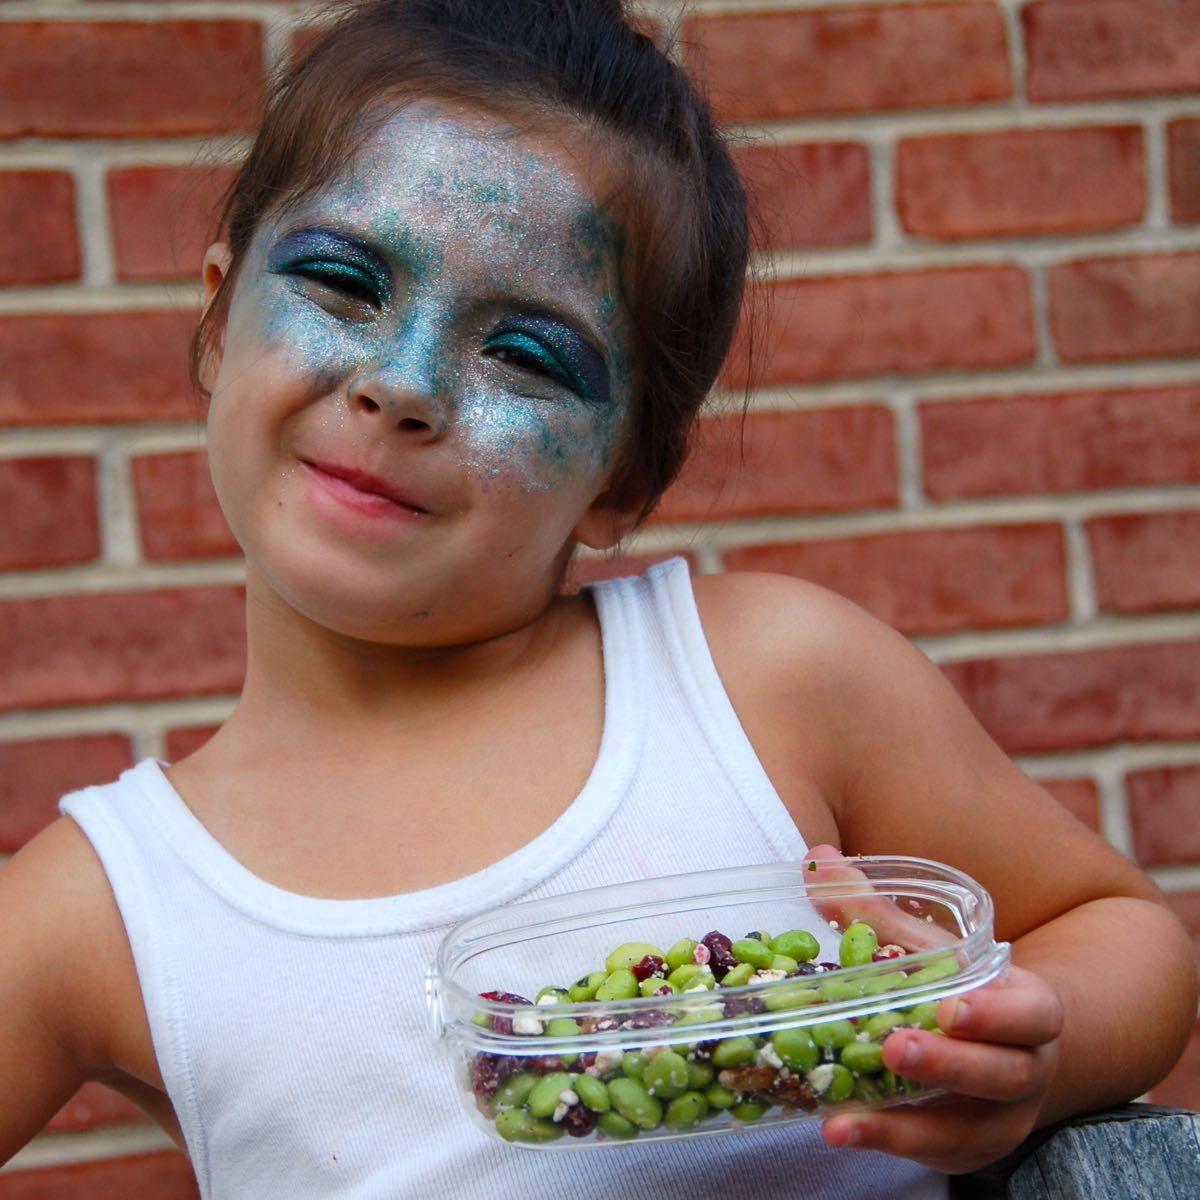 Post-Play Snack: Let's Dish Cranberry Walnut Edamame Salad